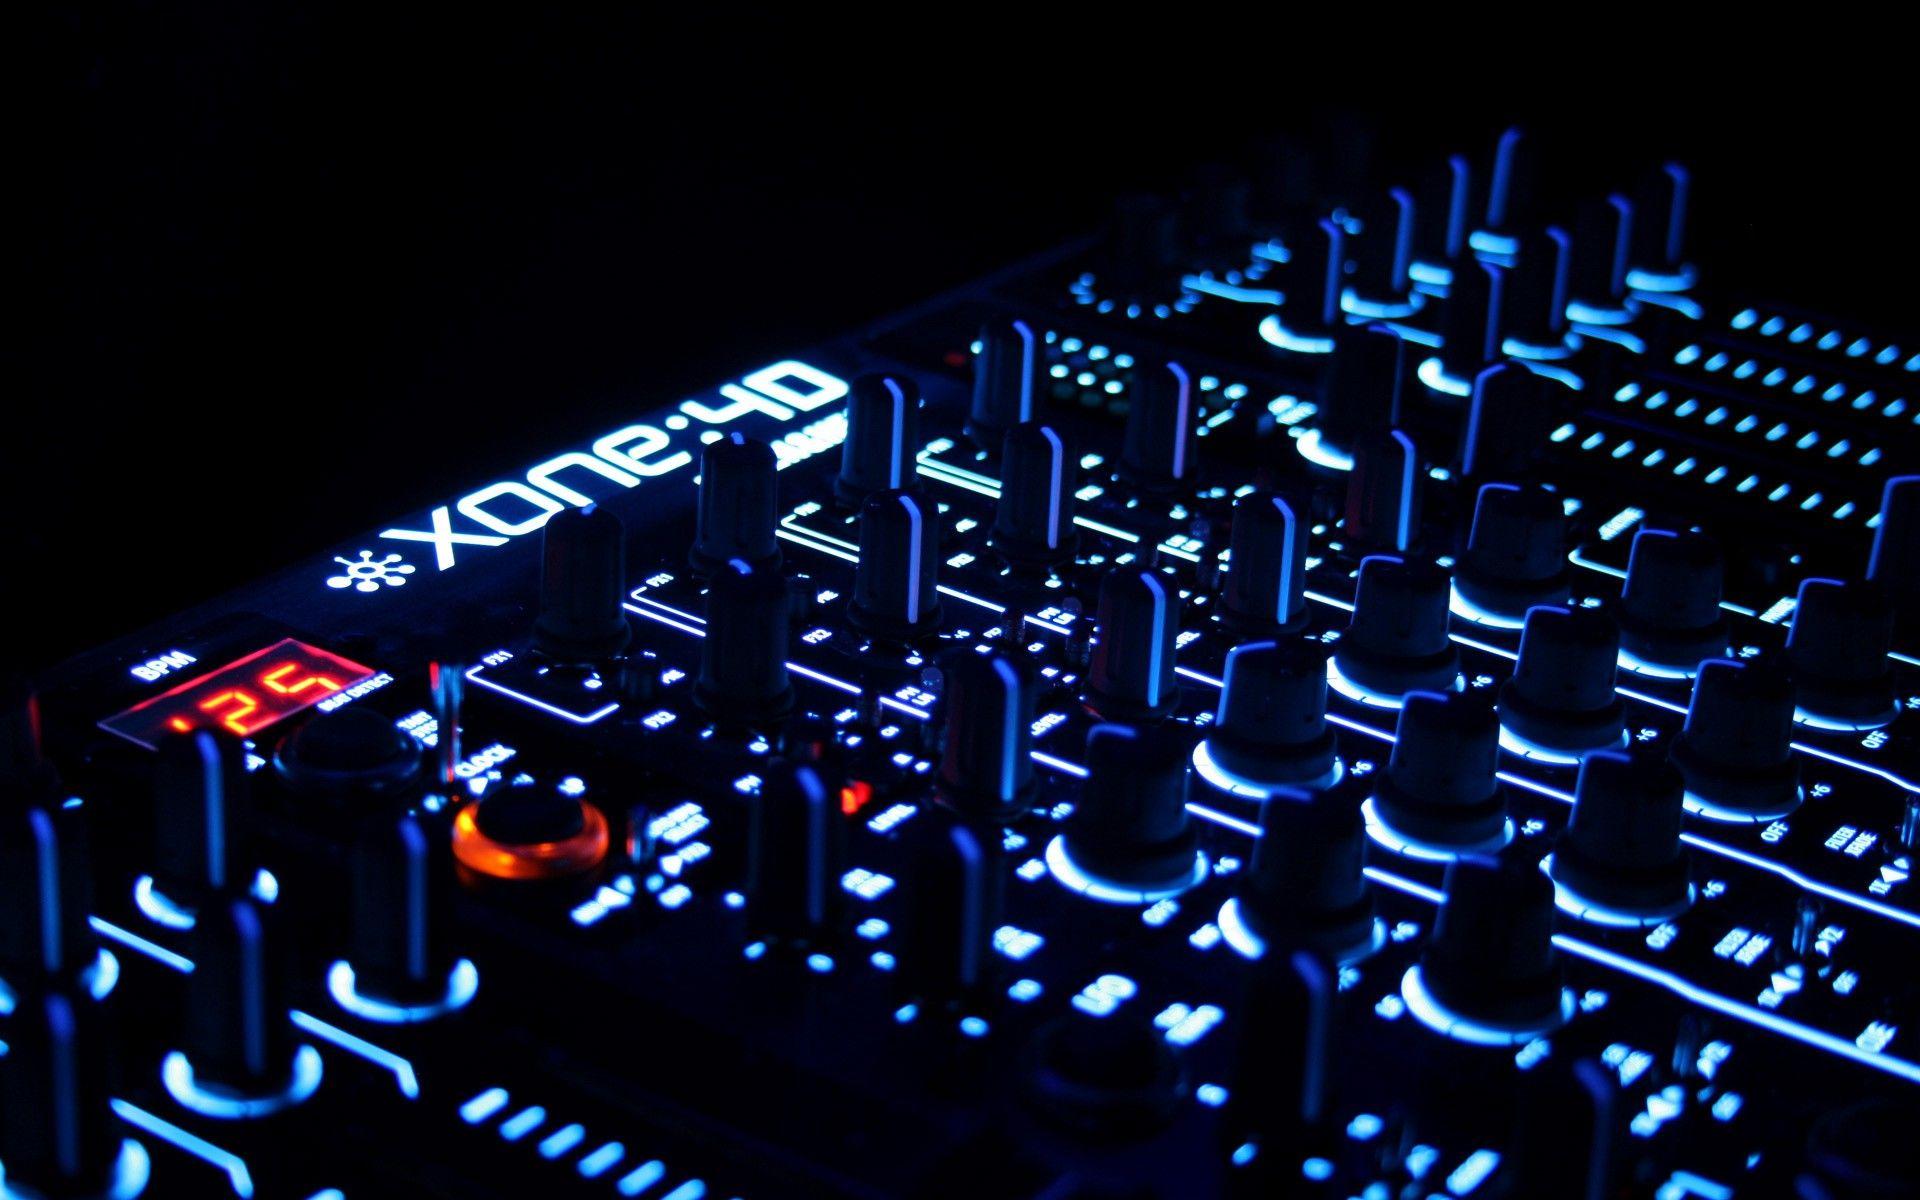 Music Wallpapers Hd In 2020 Music Wallpaper Dj Music Electronic Music